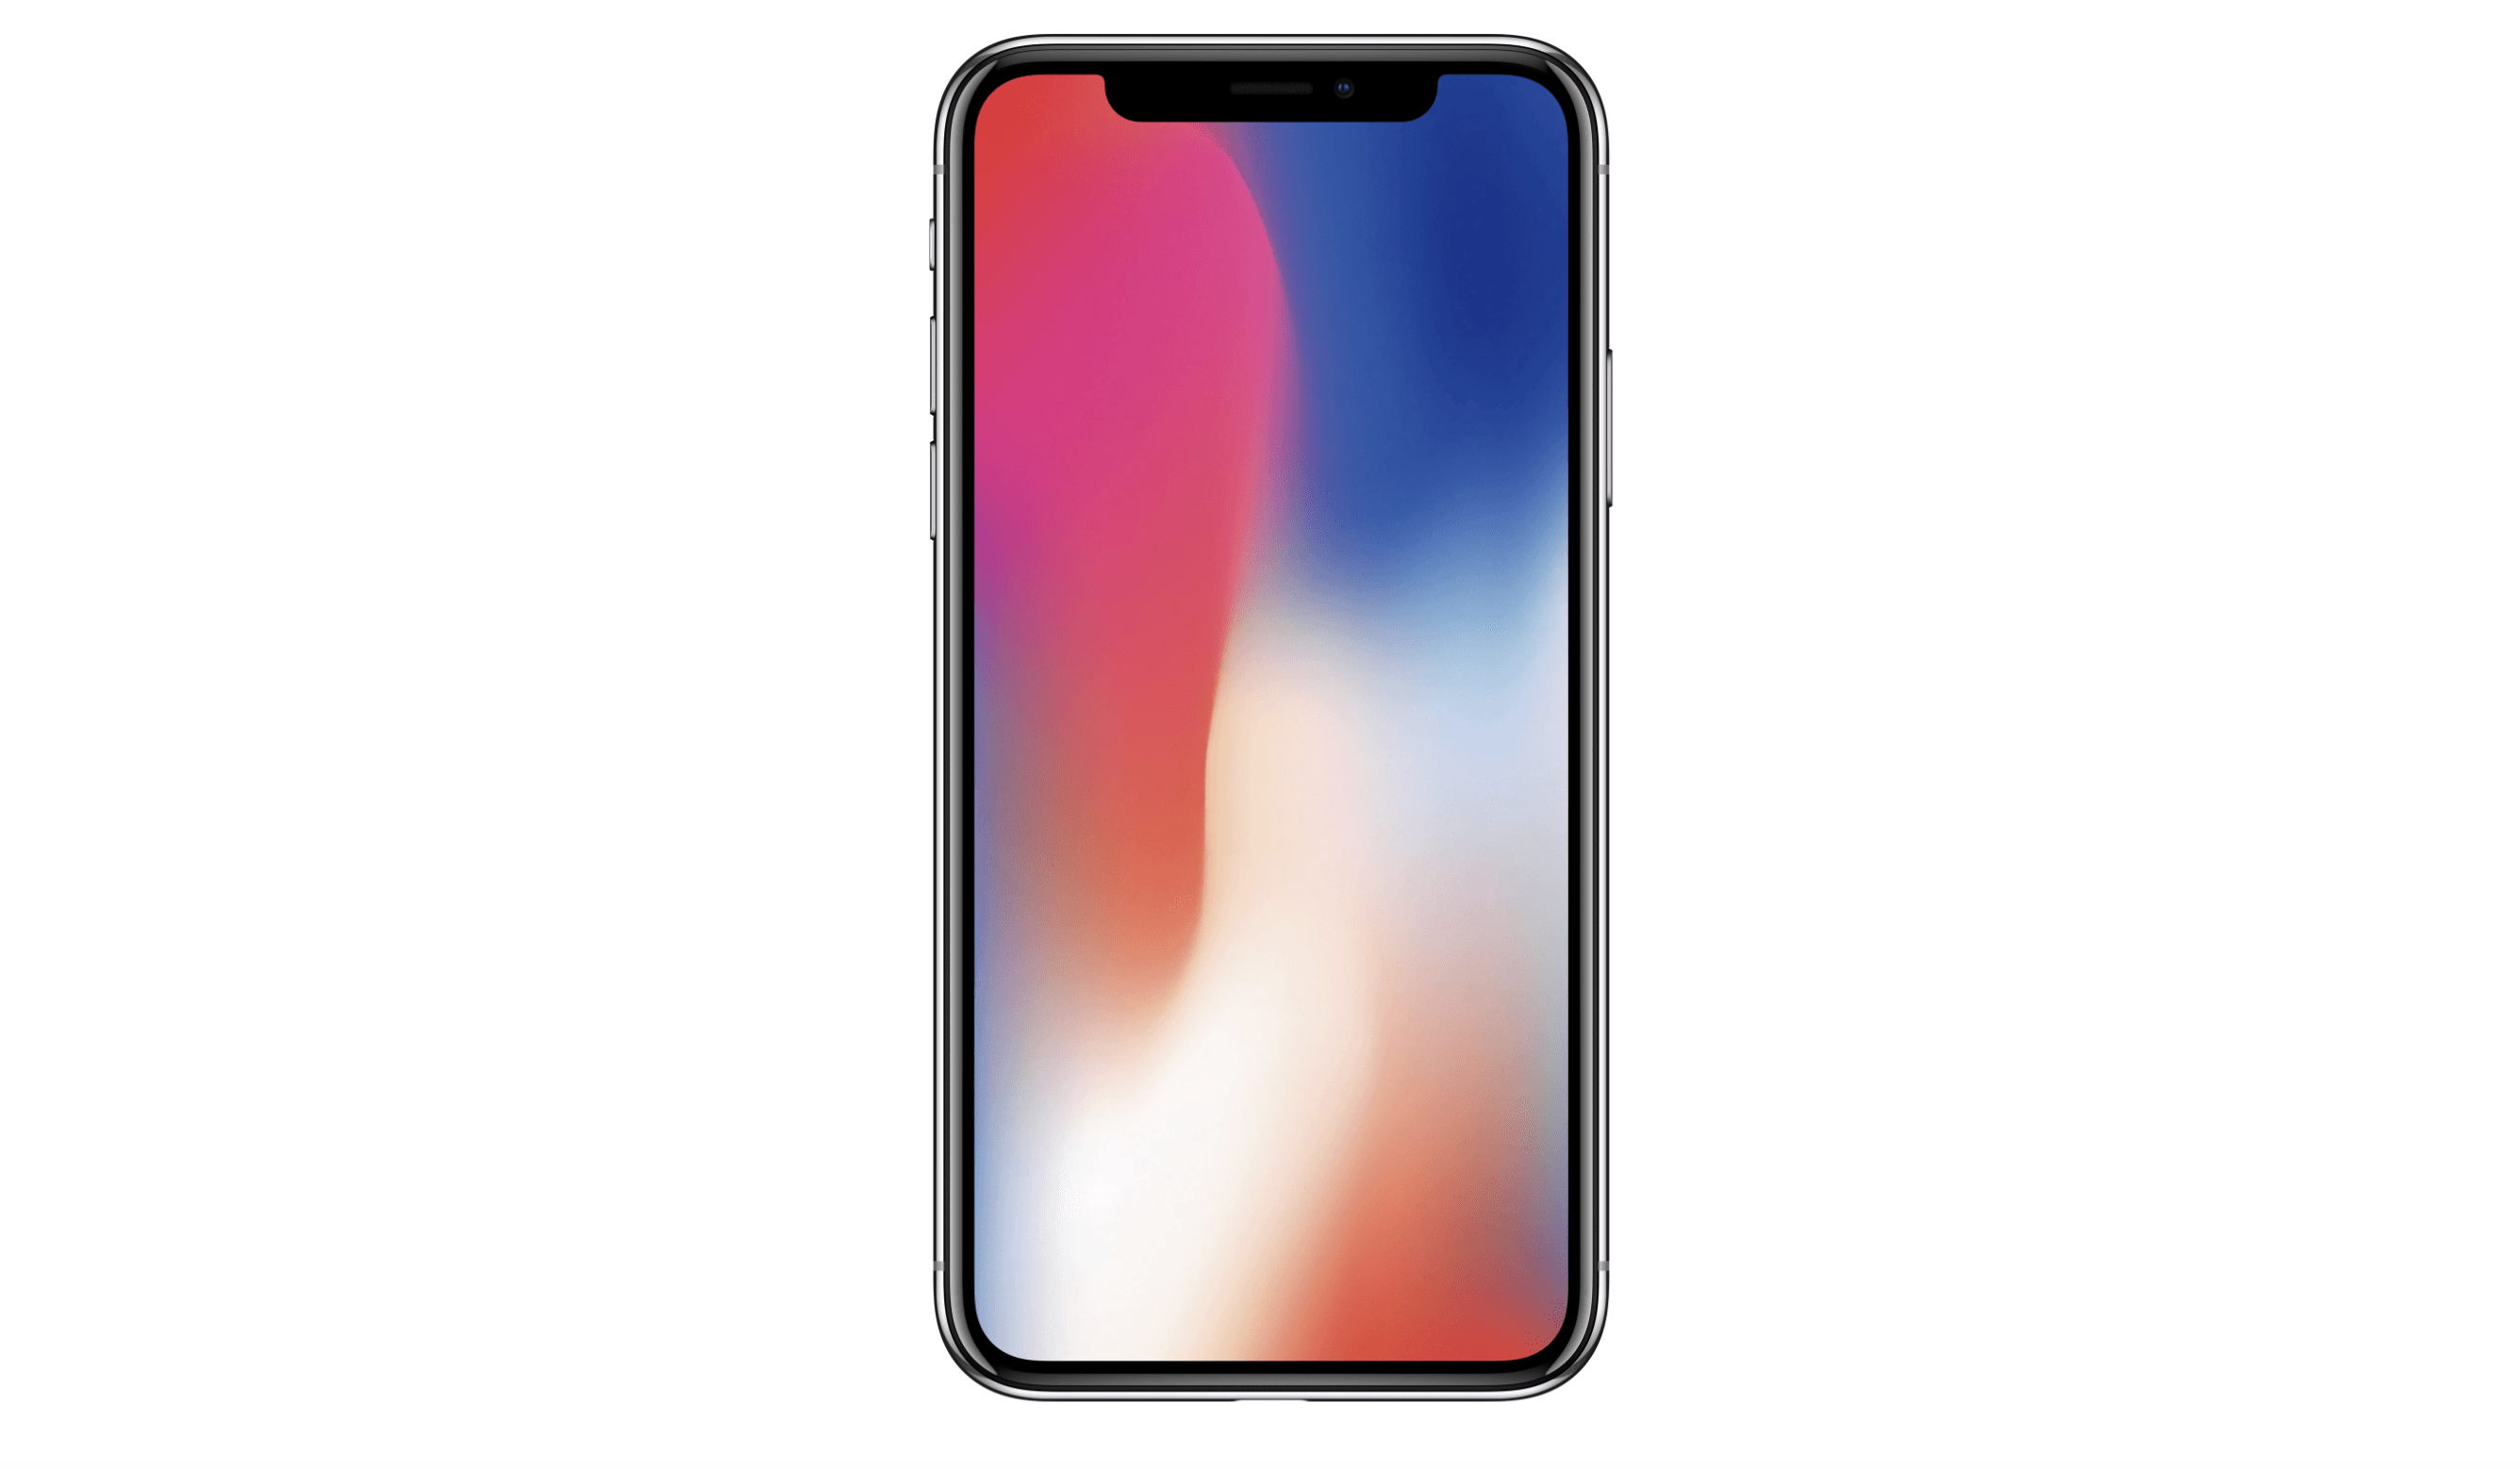 Vente Ecran Iphone